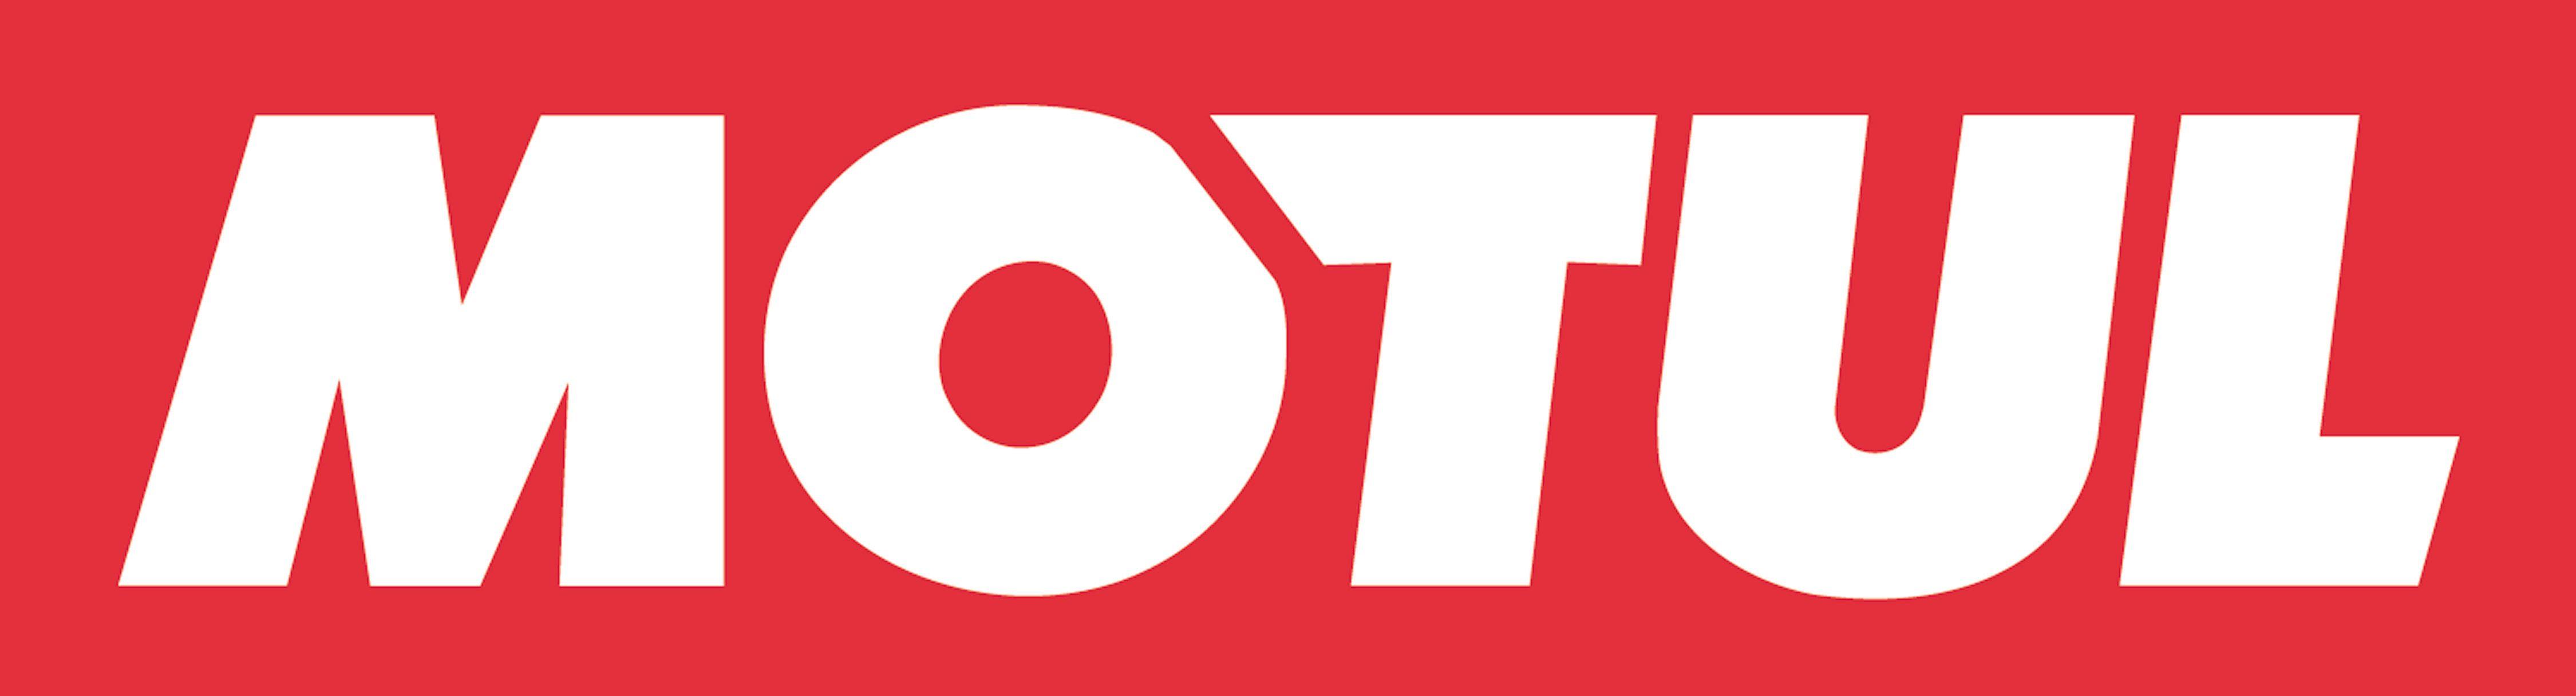 Logo_Motul_Red.jpg 4,500×1,215 pixels Motul, Bumper